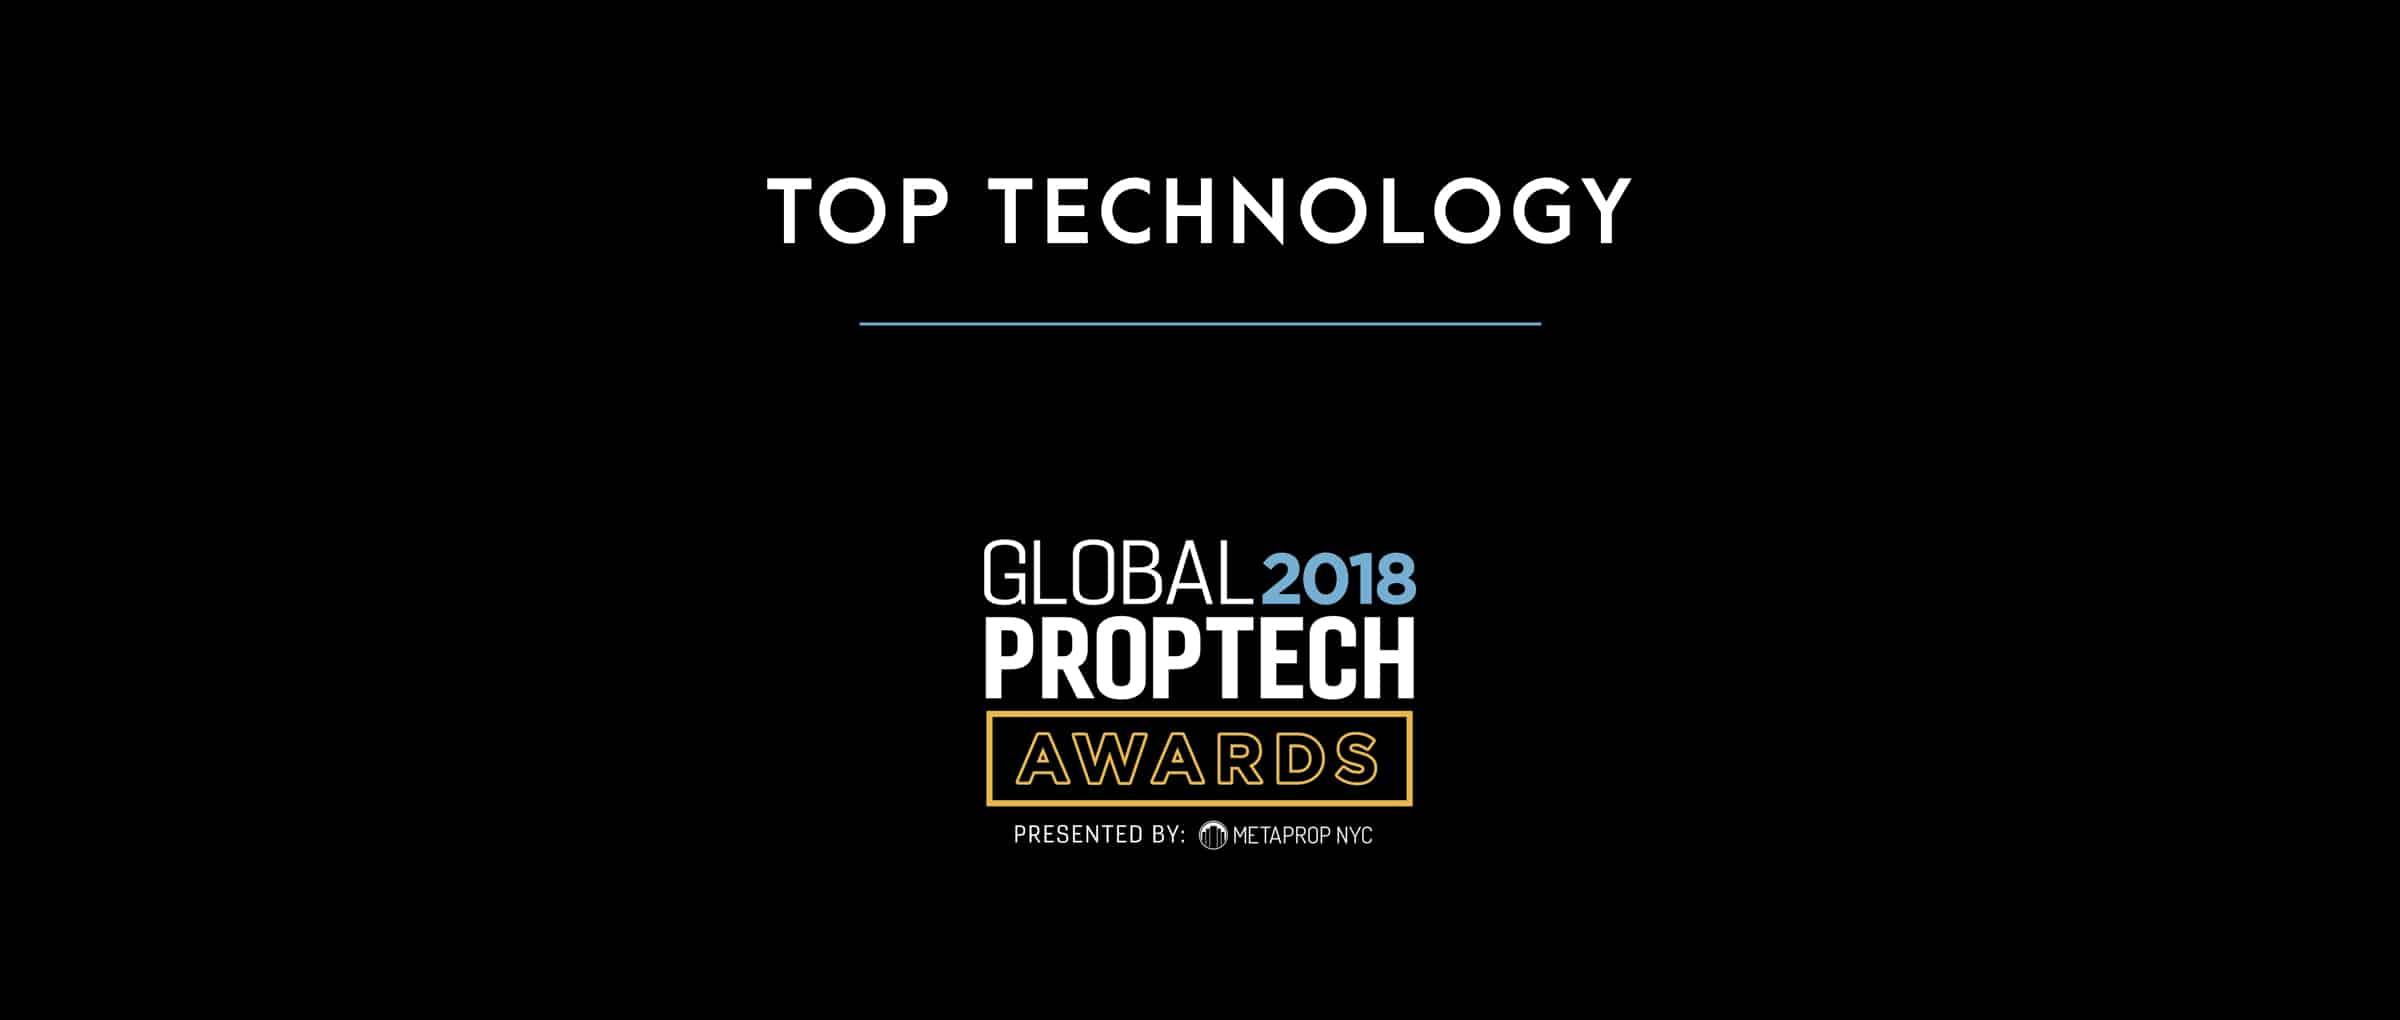 Top Technology PropTech Awards